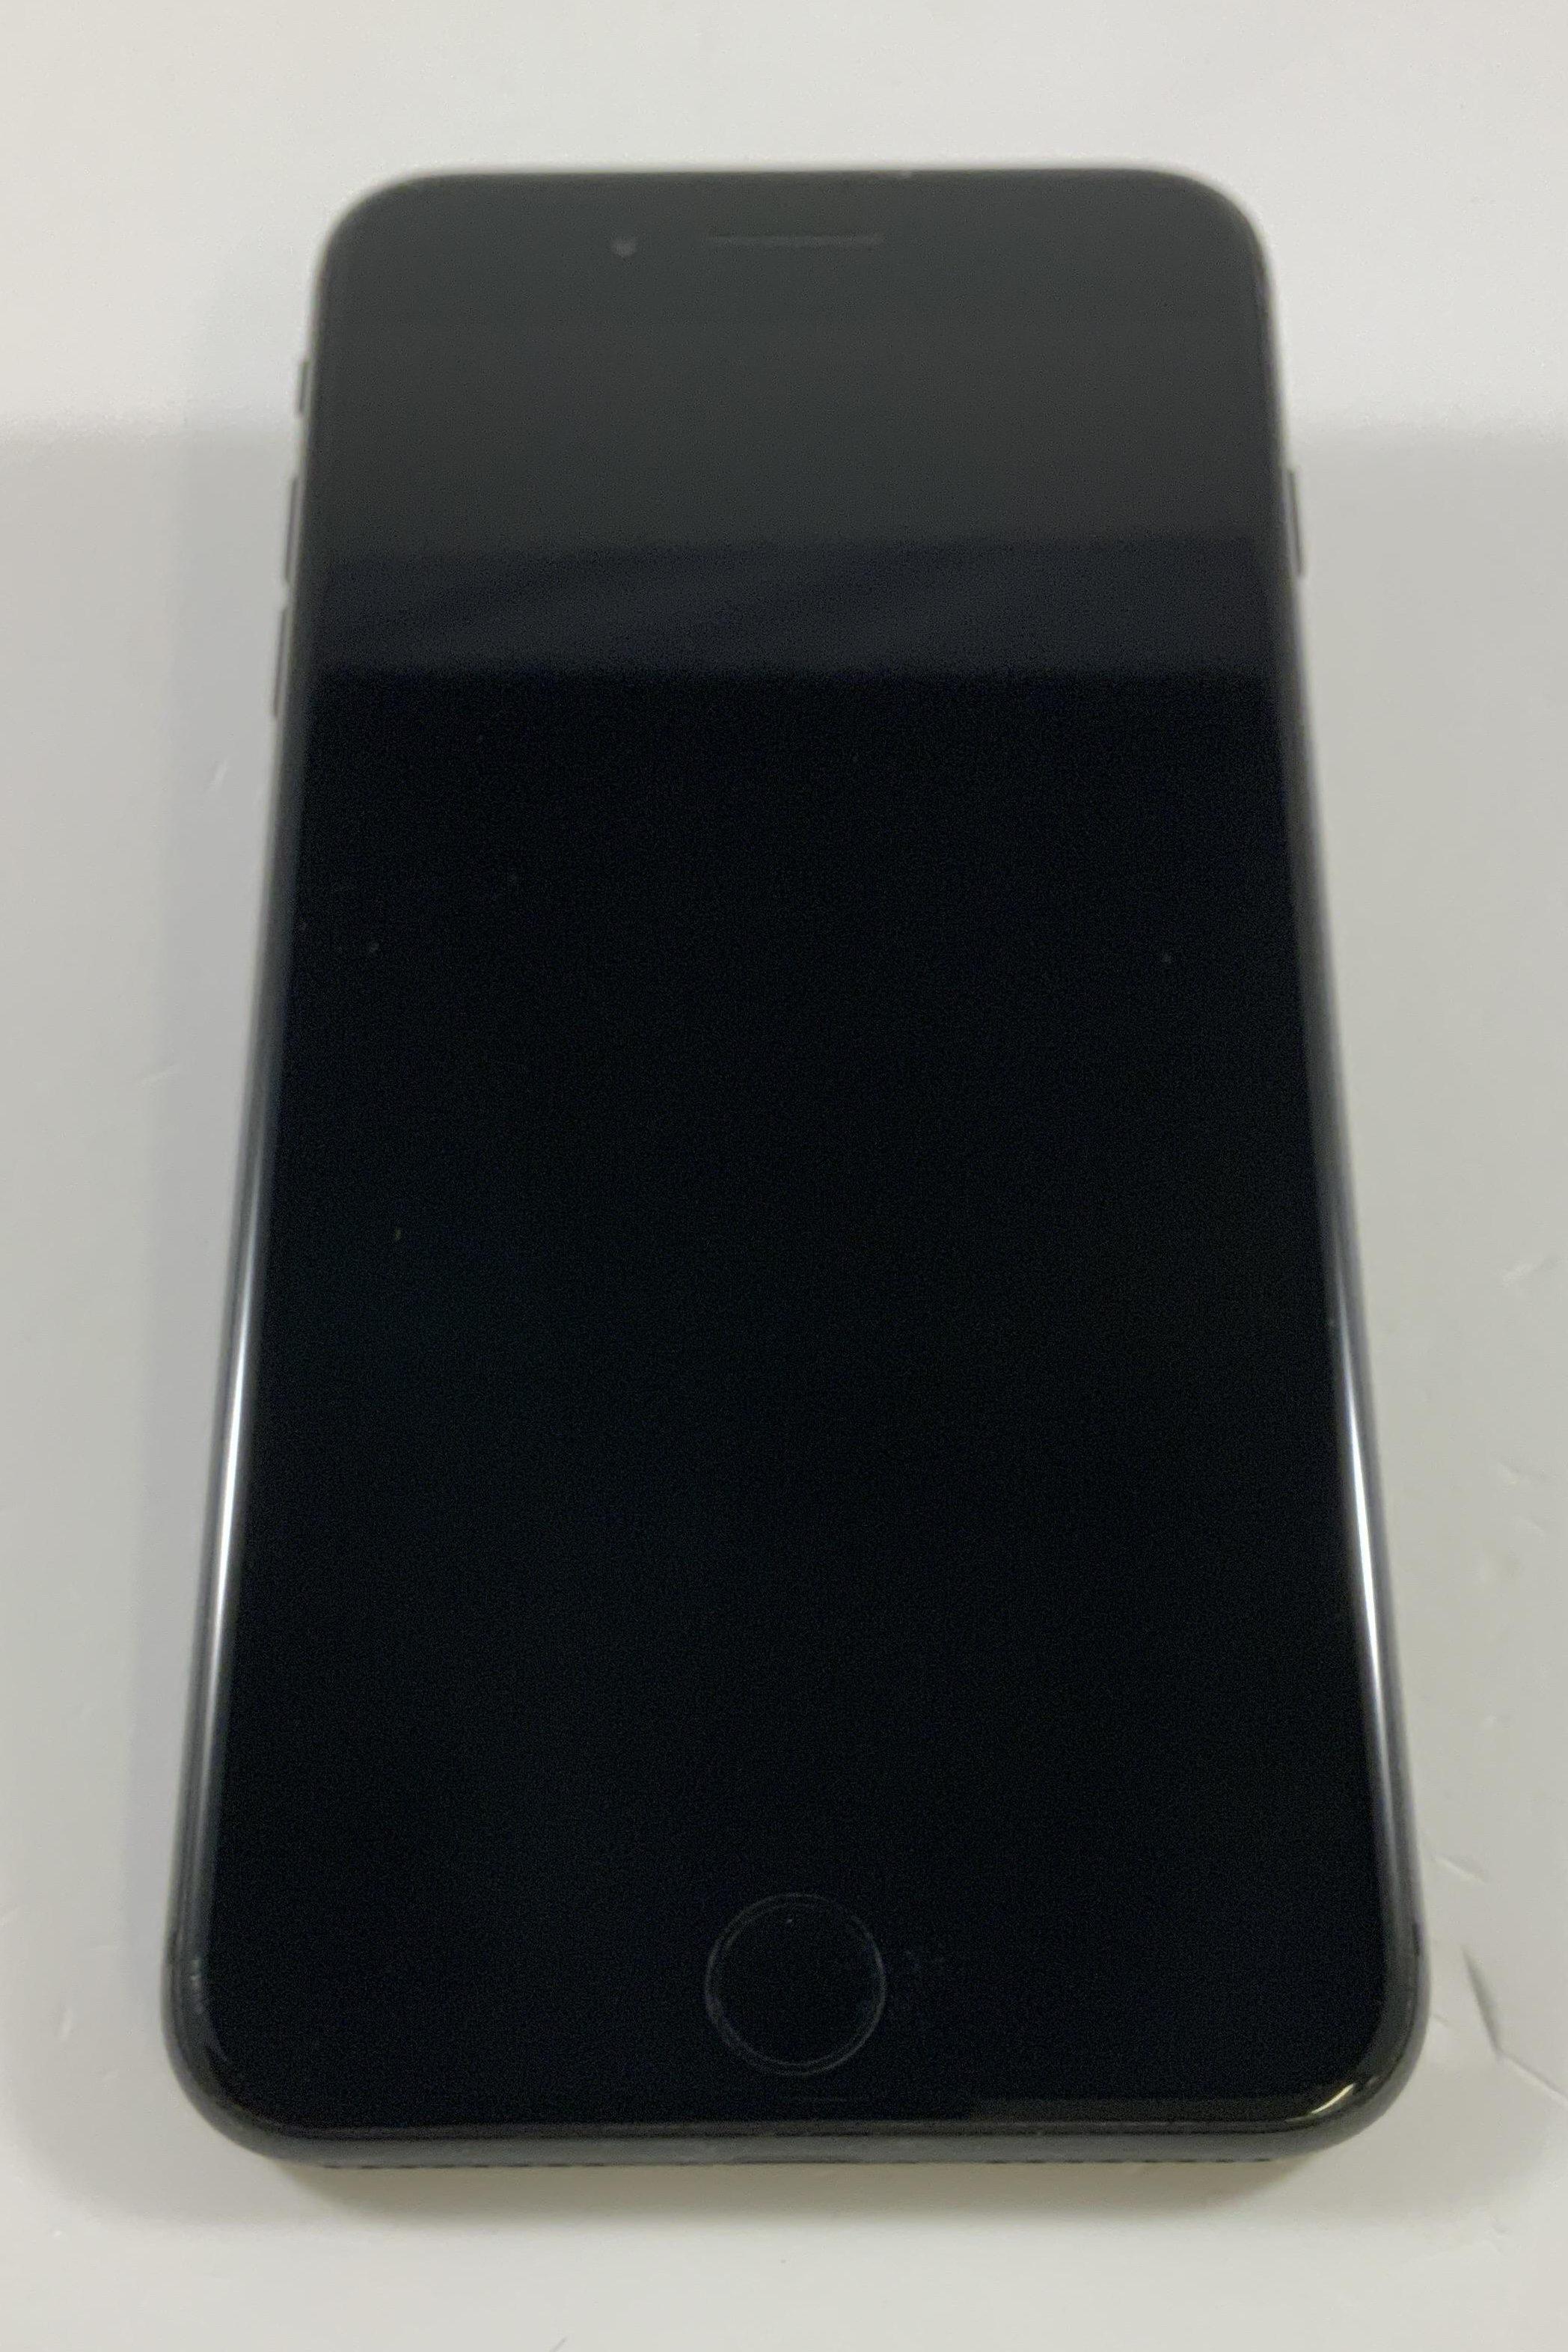 iPhone 8 Plus 64GB, 64GB, Space Gray, Kuva 1